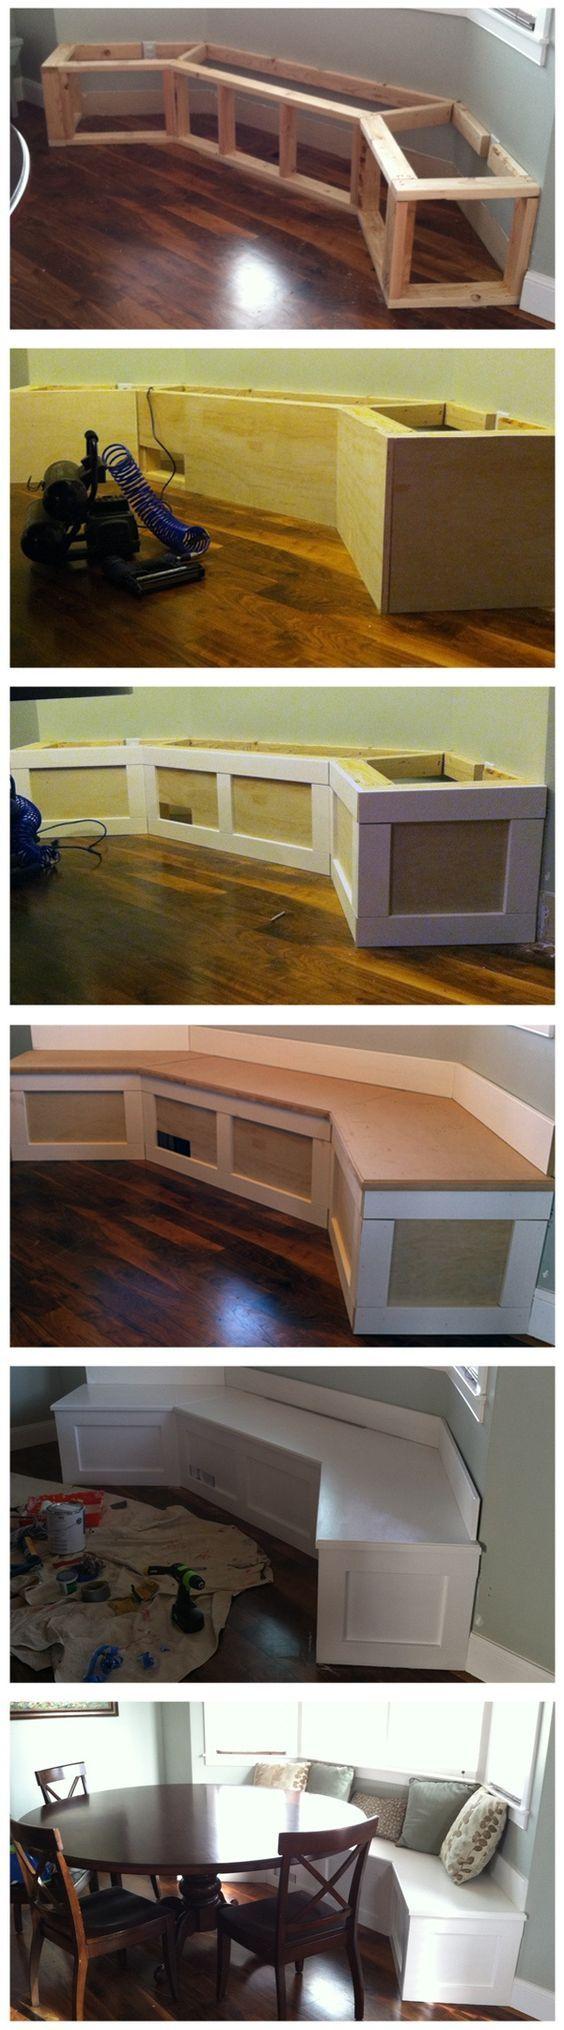 DIY banquette. *Source: http://www.mcarthurhomes.com/2013/3/26/1255